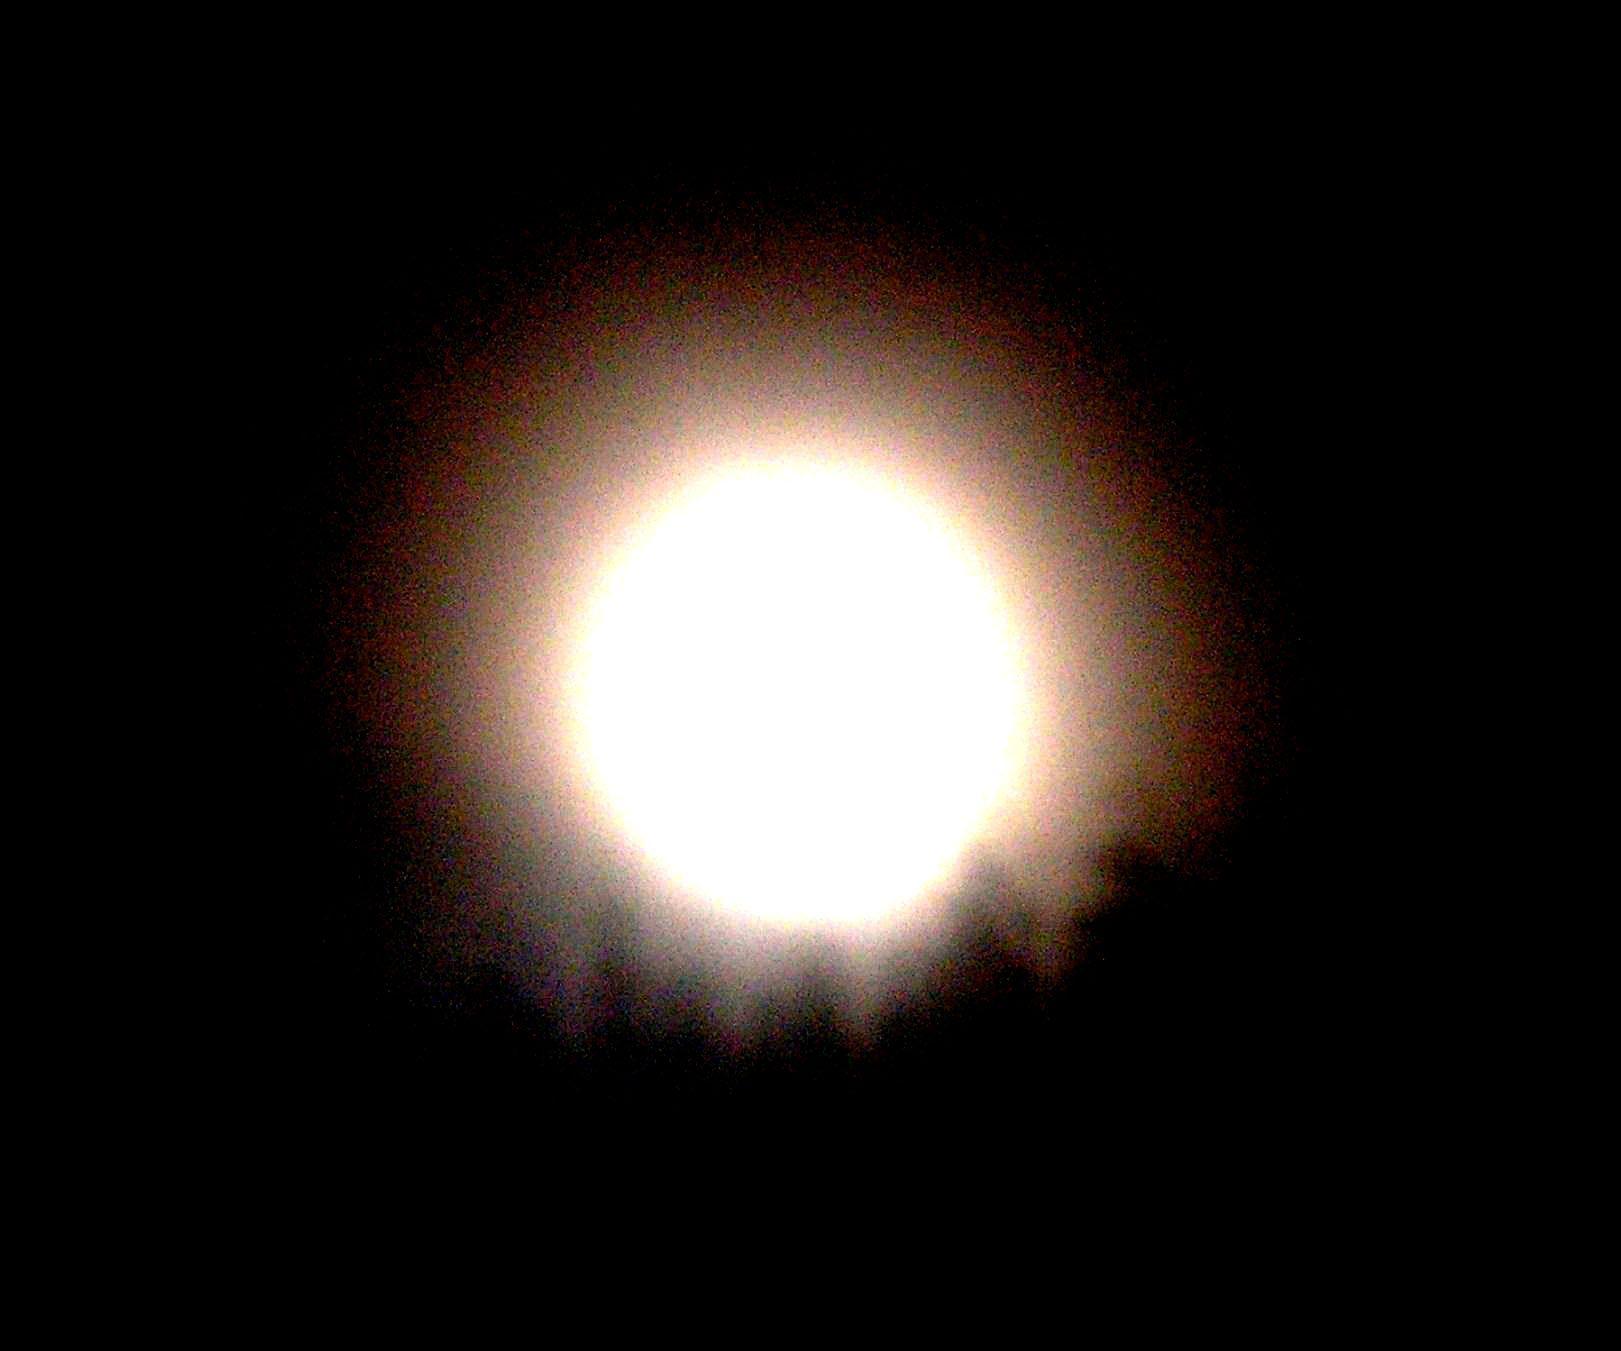 Elmozdultak a Hold sarkai